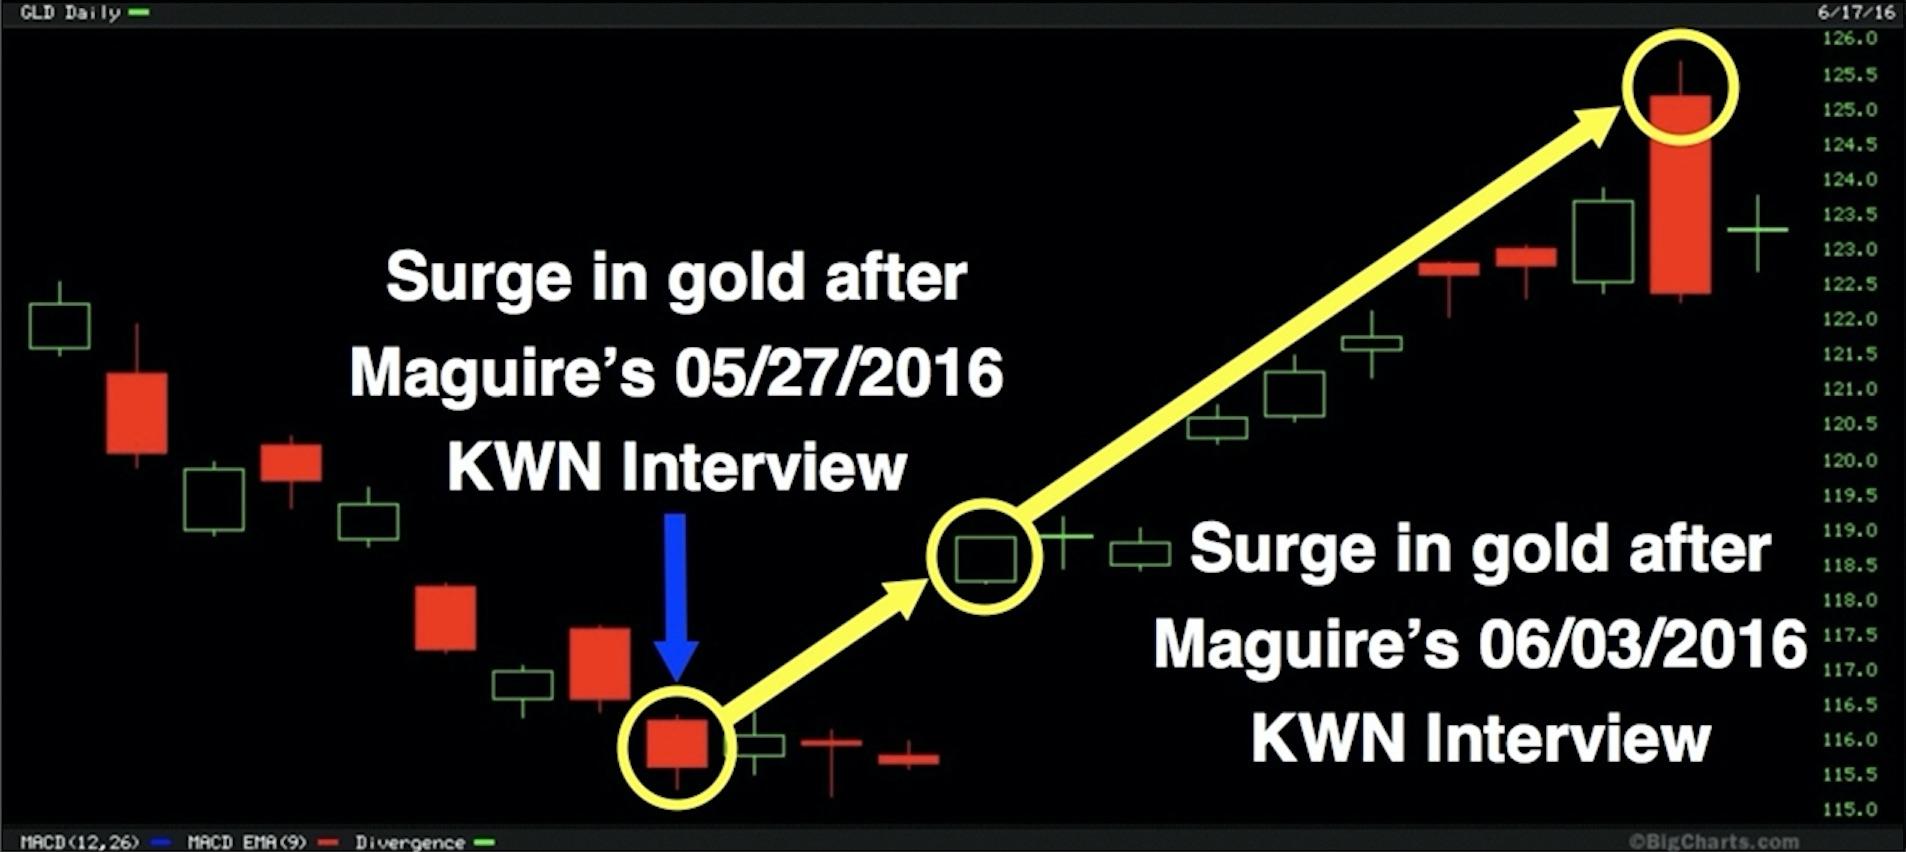 KWN Maguire III 6:17:2016